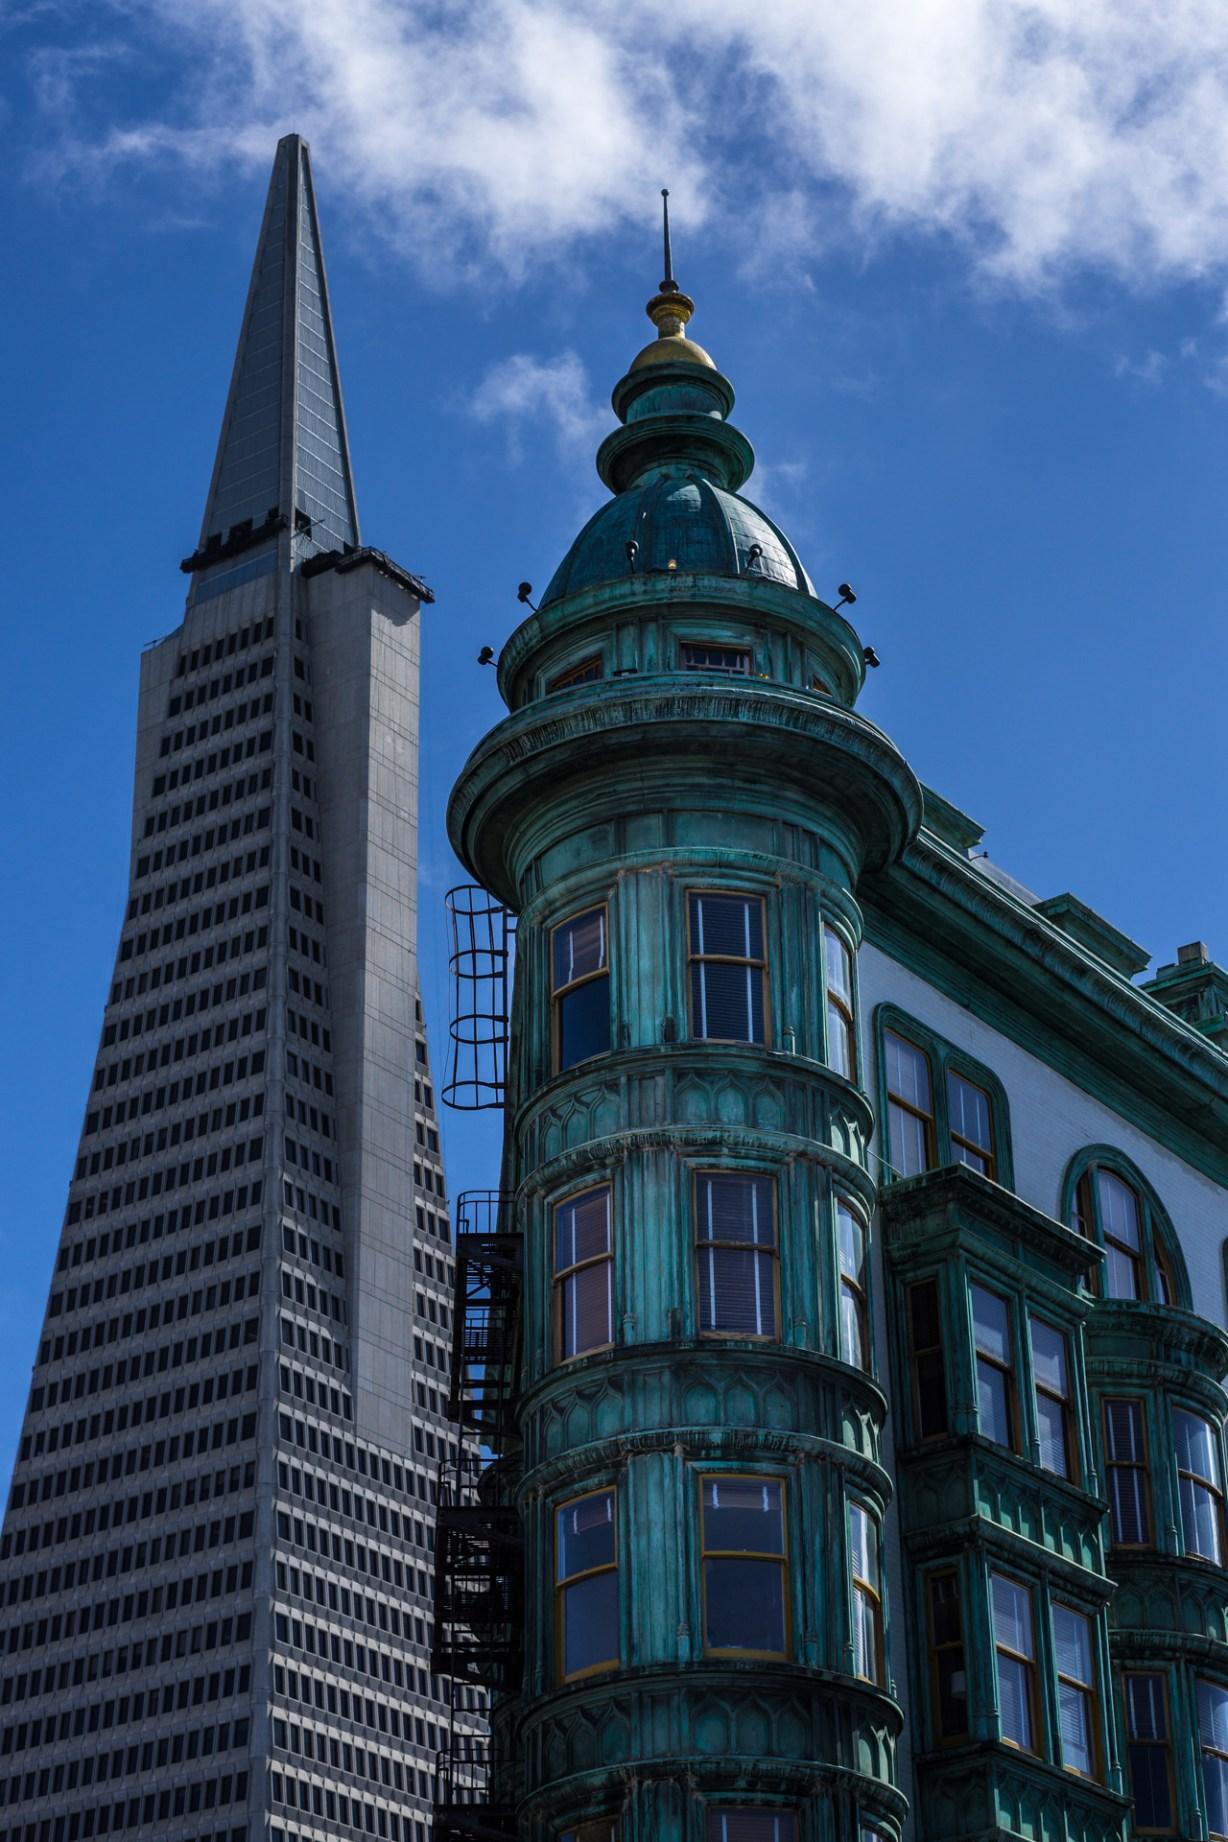 San Francisco ⎮ Transamerica Pyramid